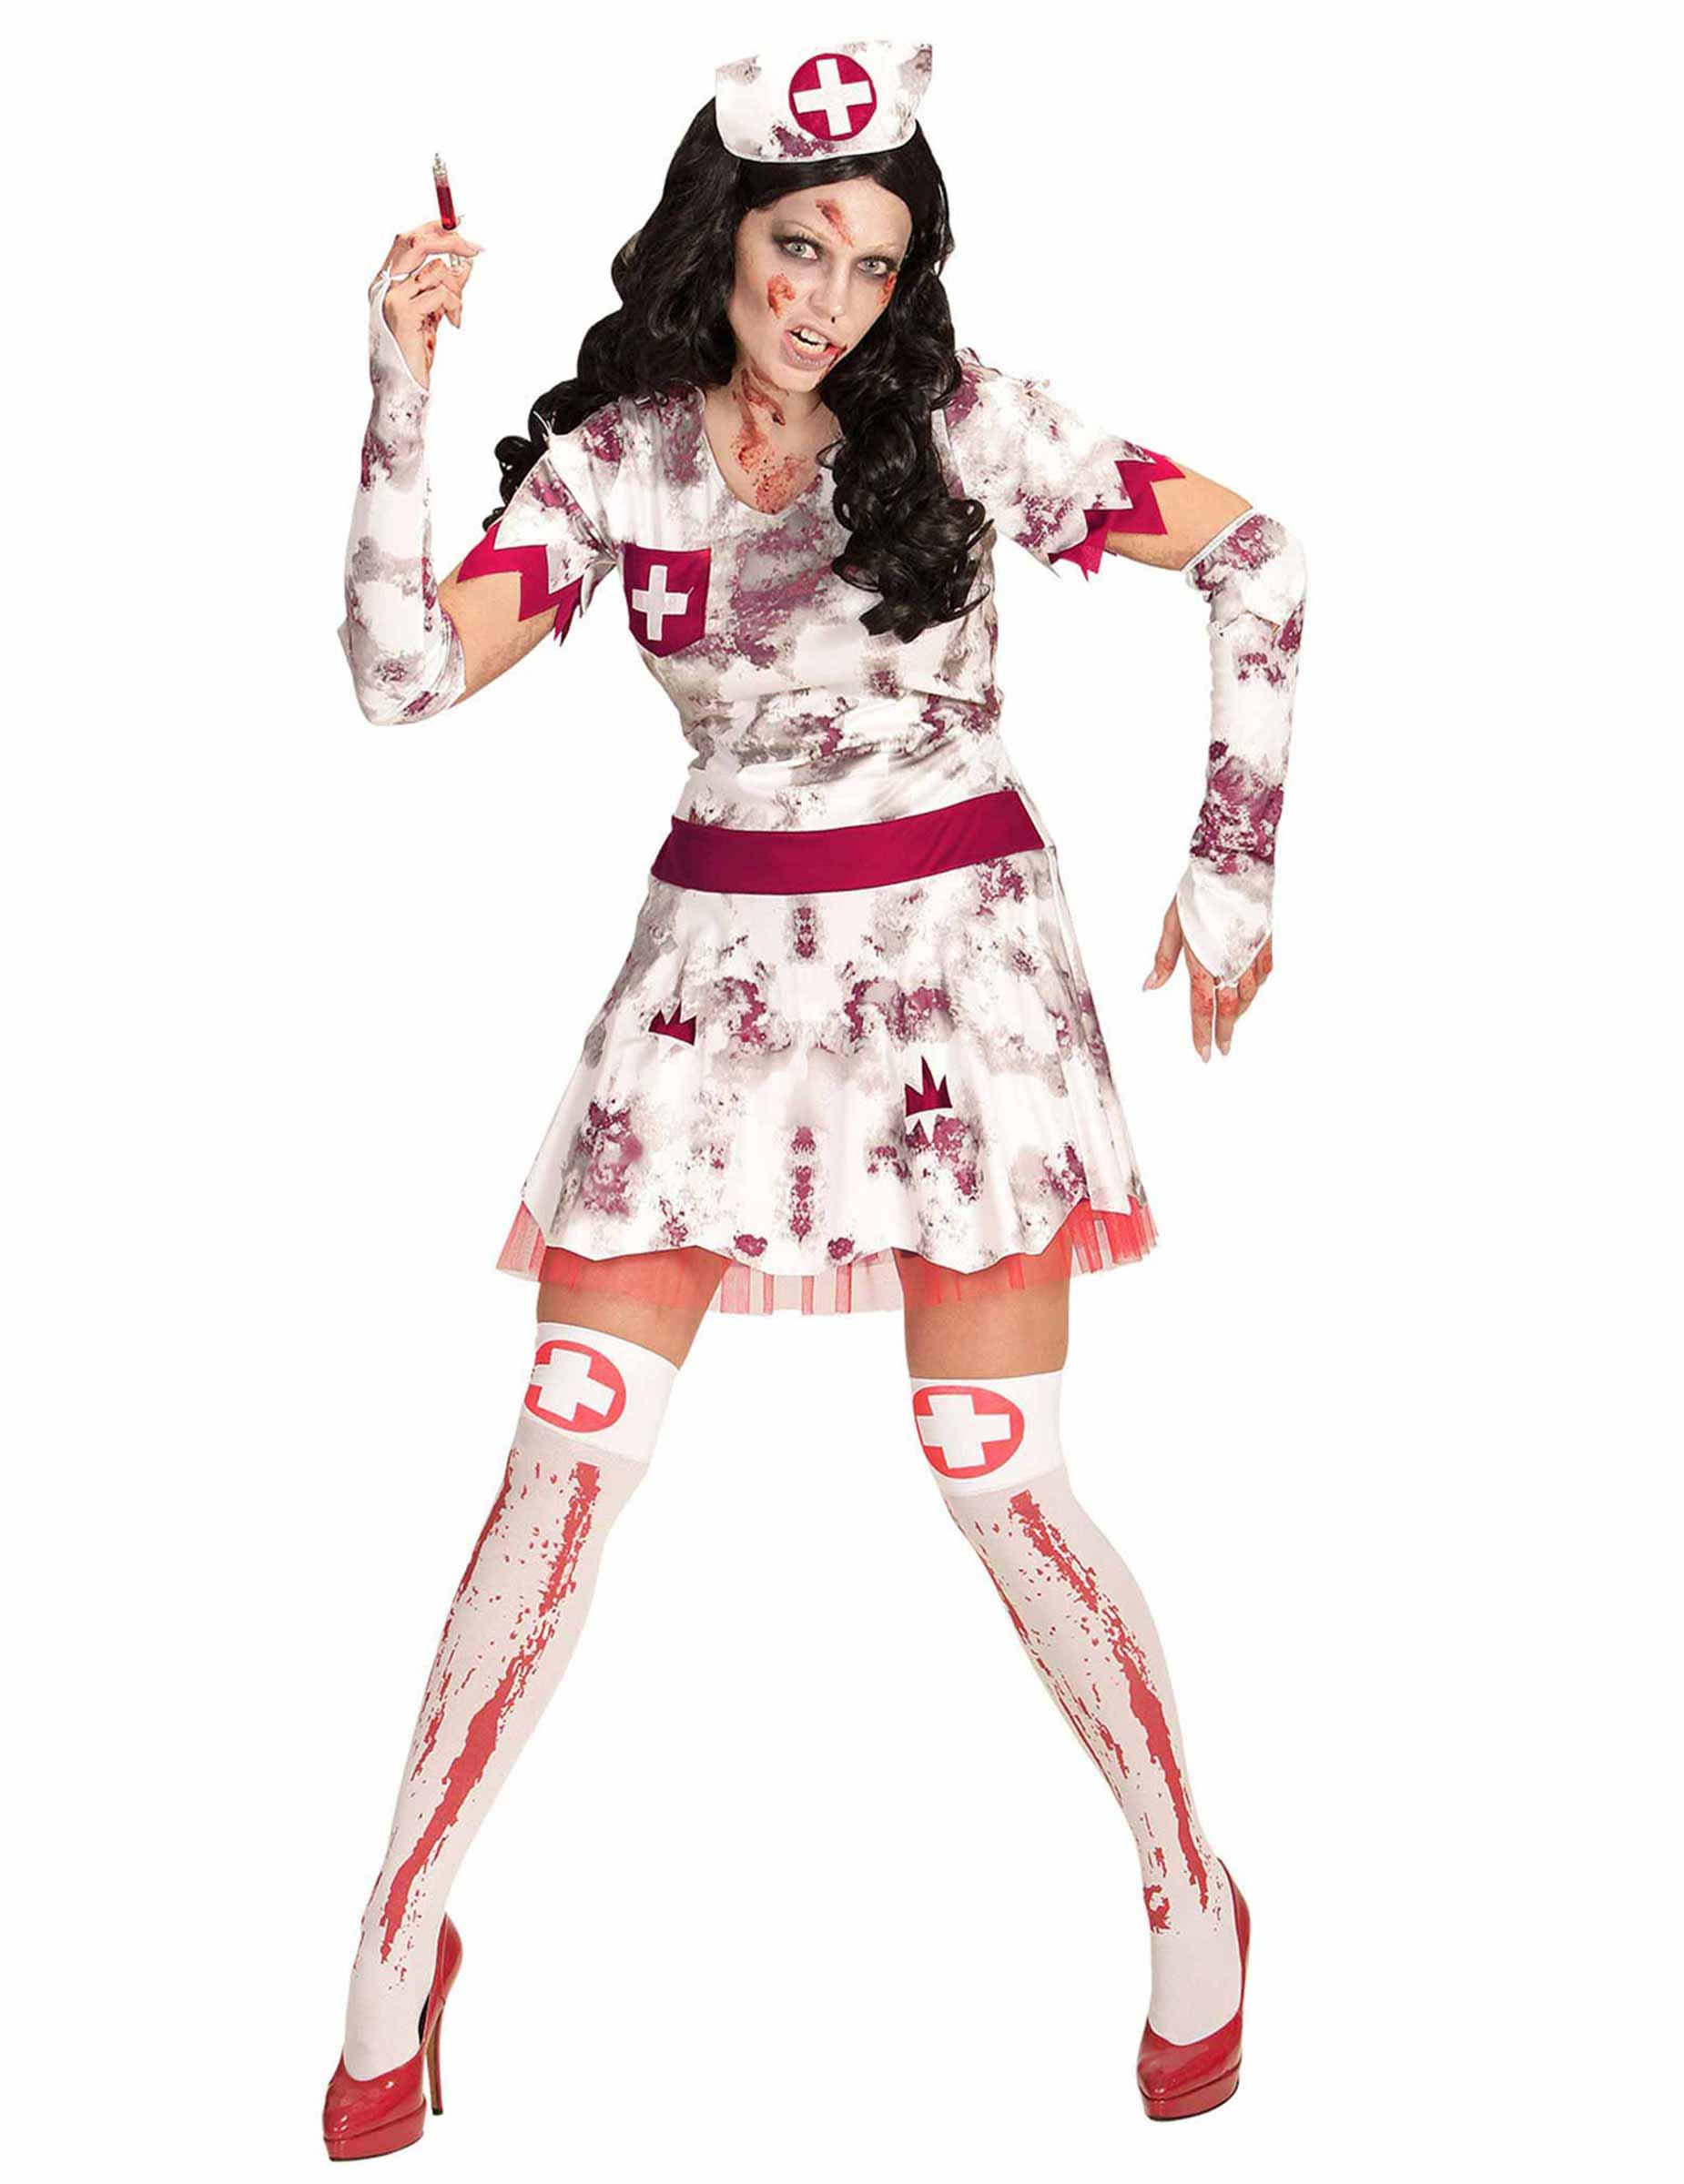 Zombifizierte Krankenschwester Halloweenkostum Fur Damen Weiss Rot